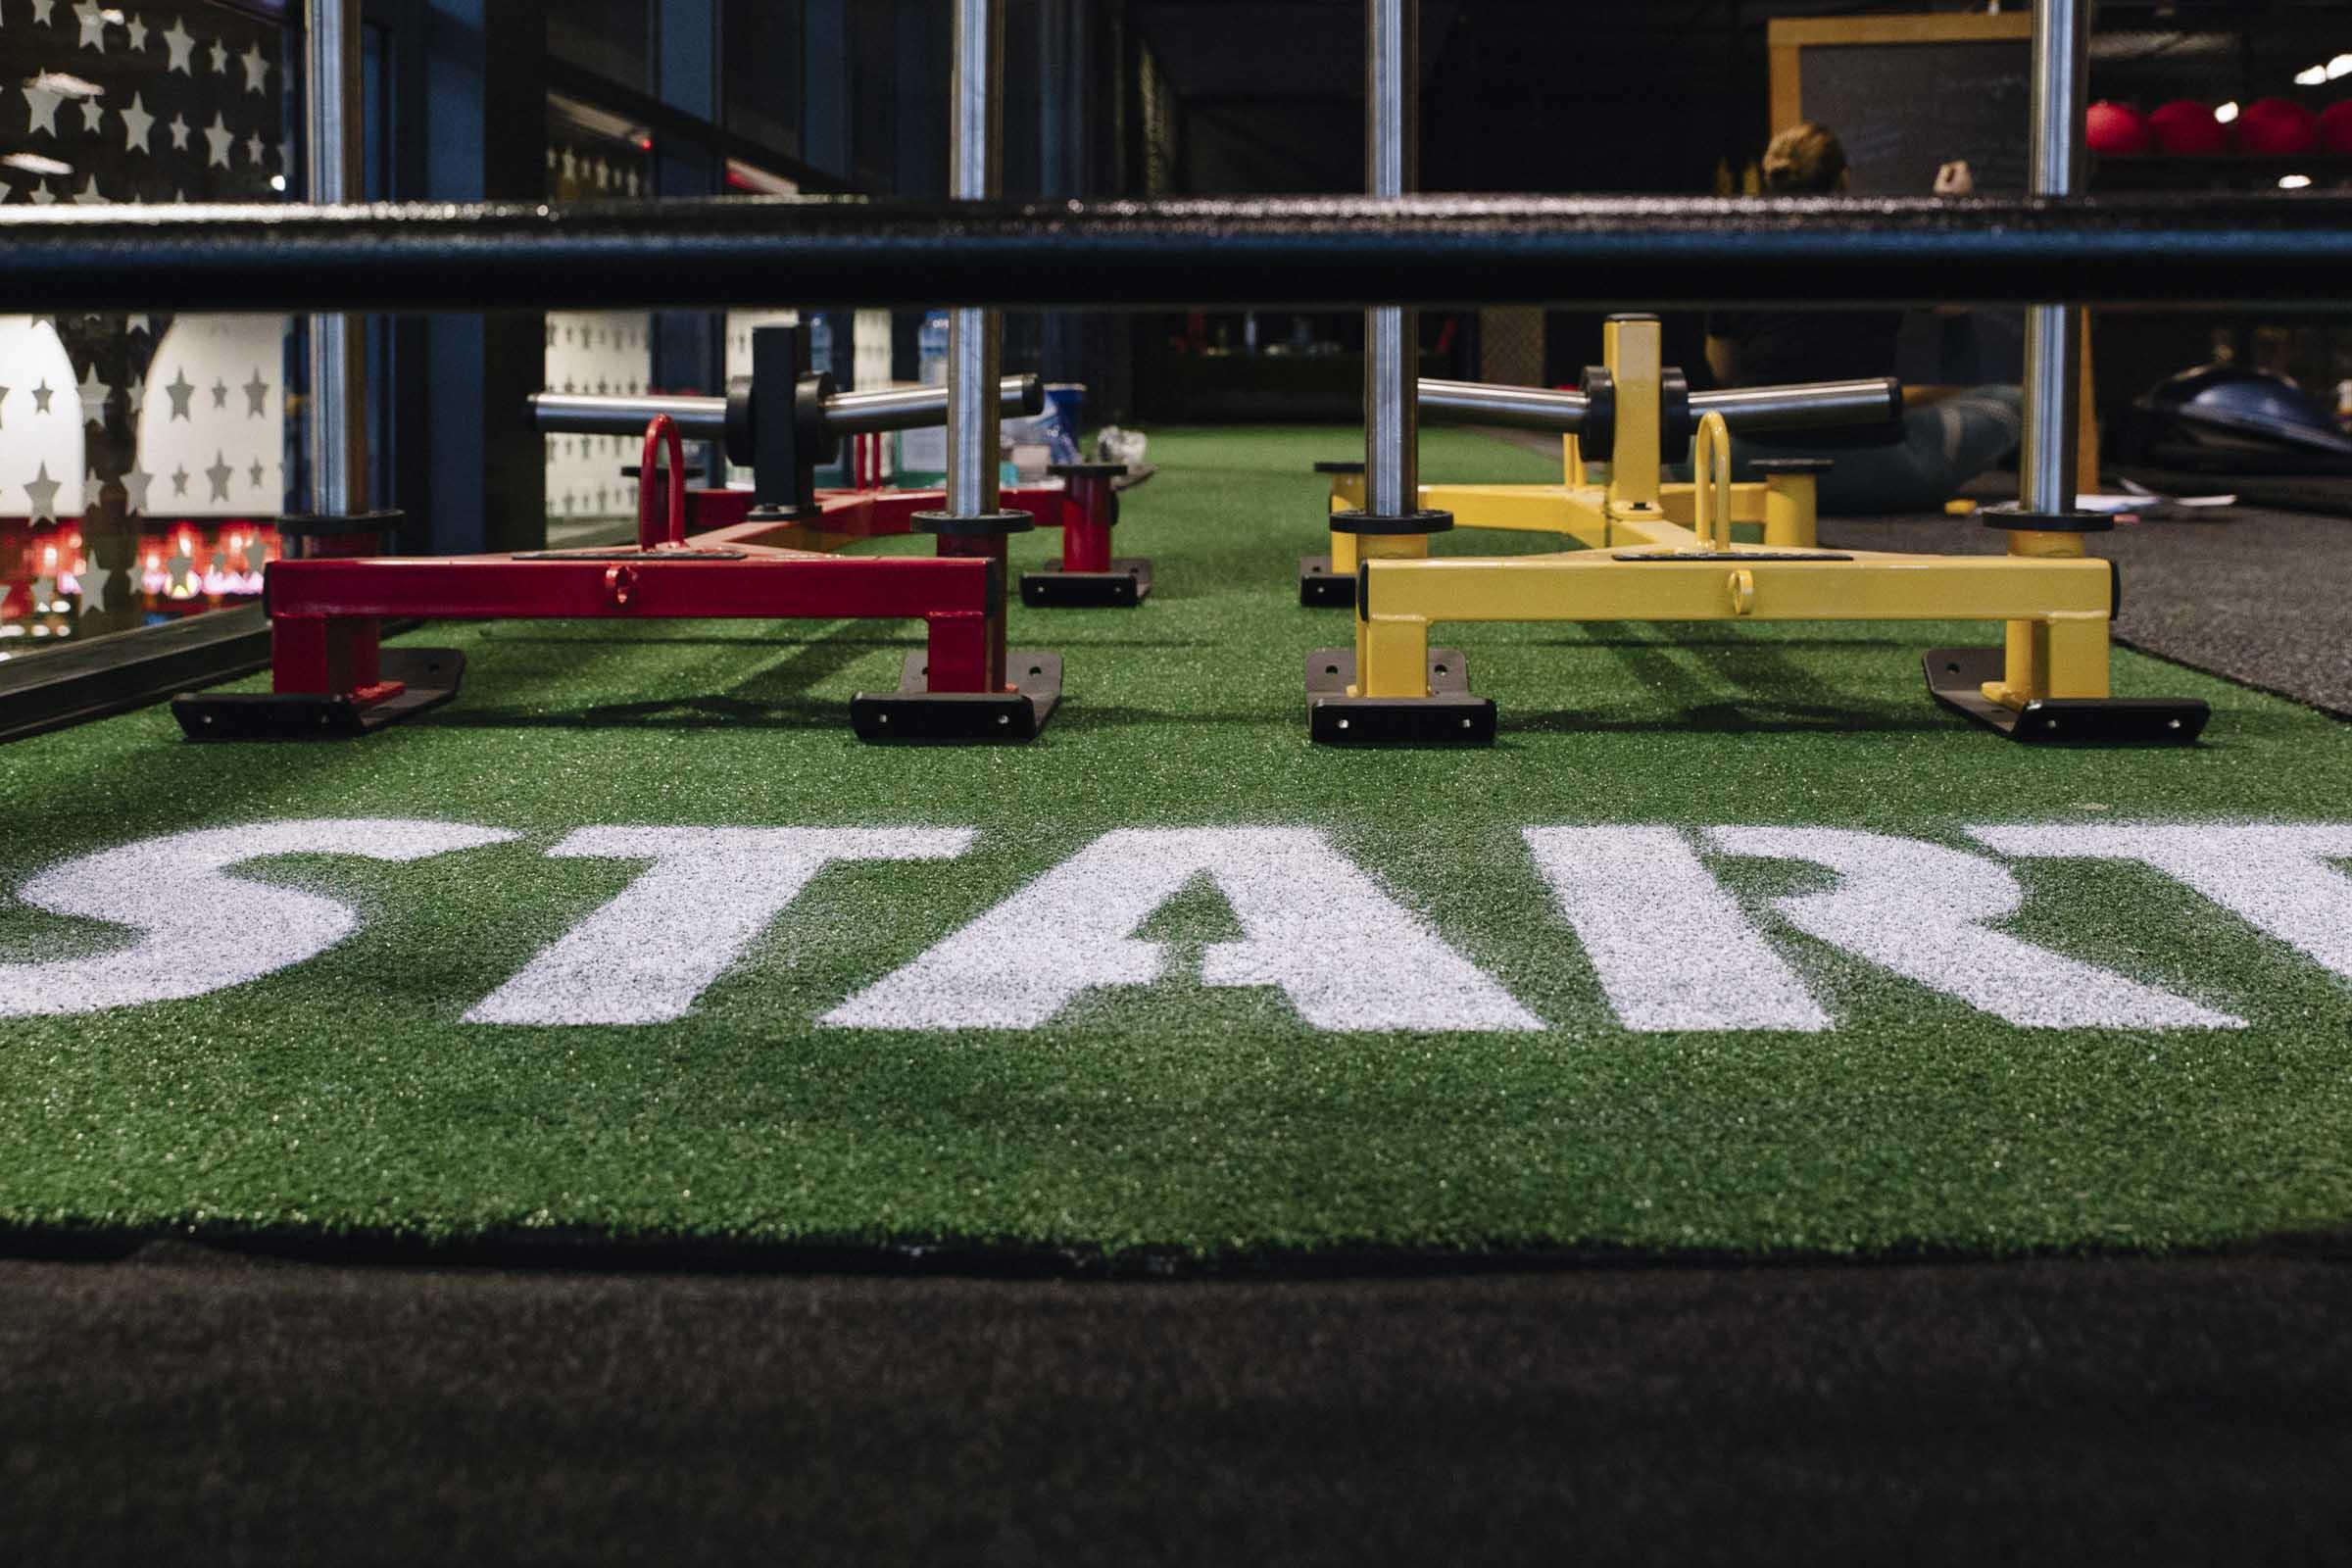 sled track palmerston gateway gym gallery